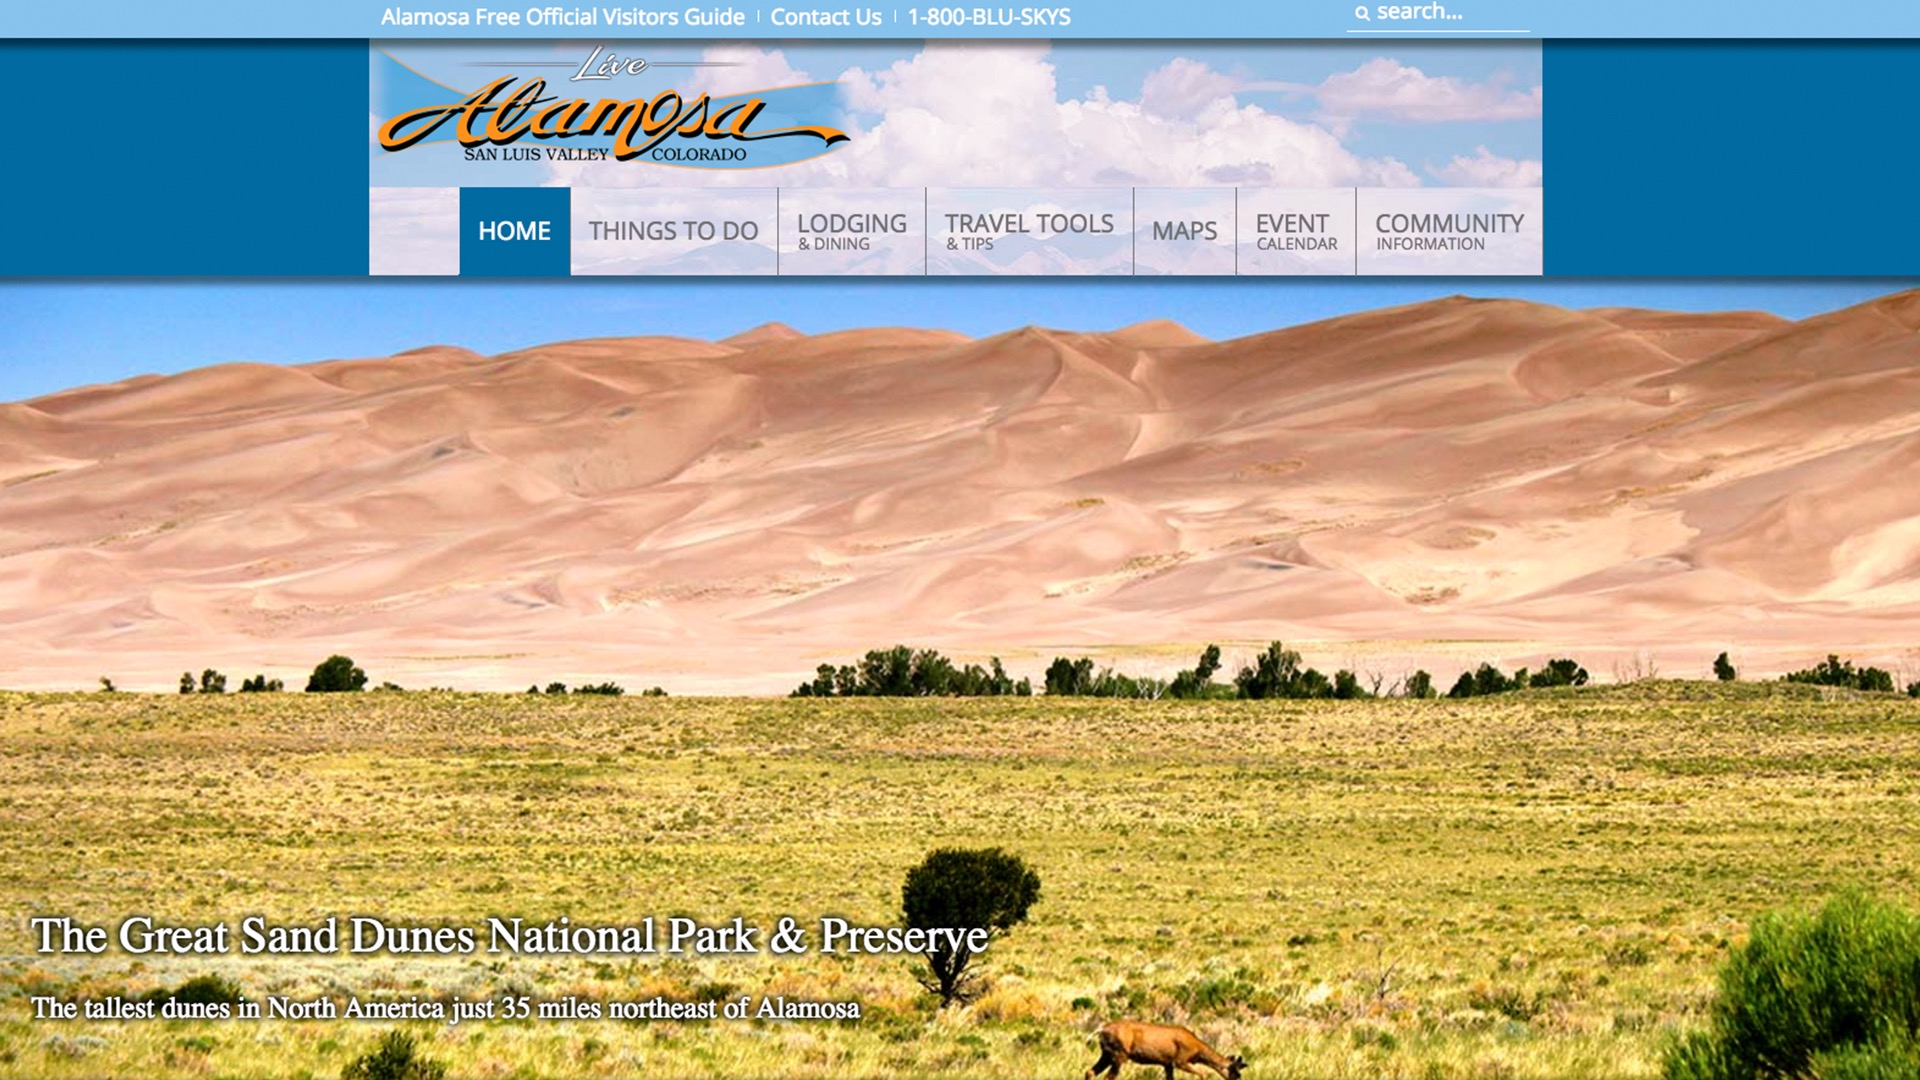 City of Alamosa website